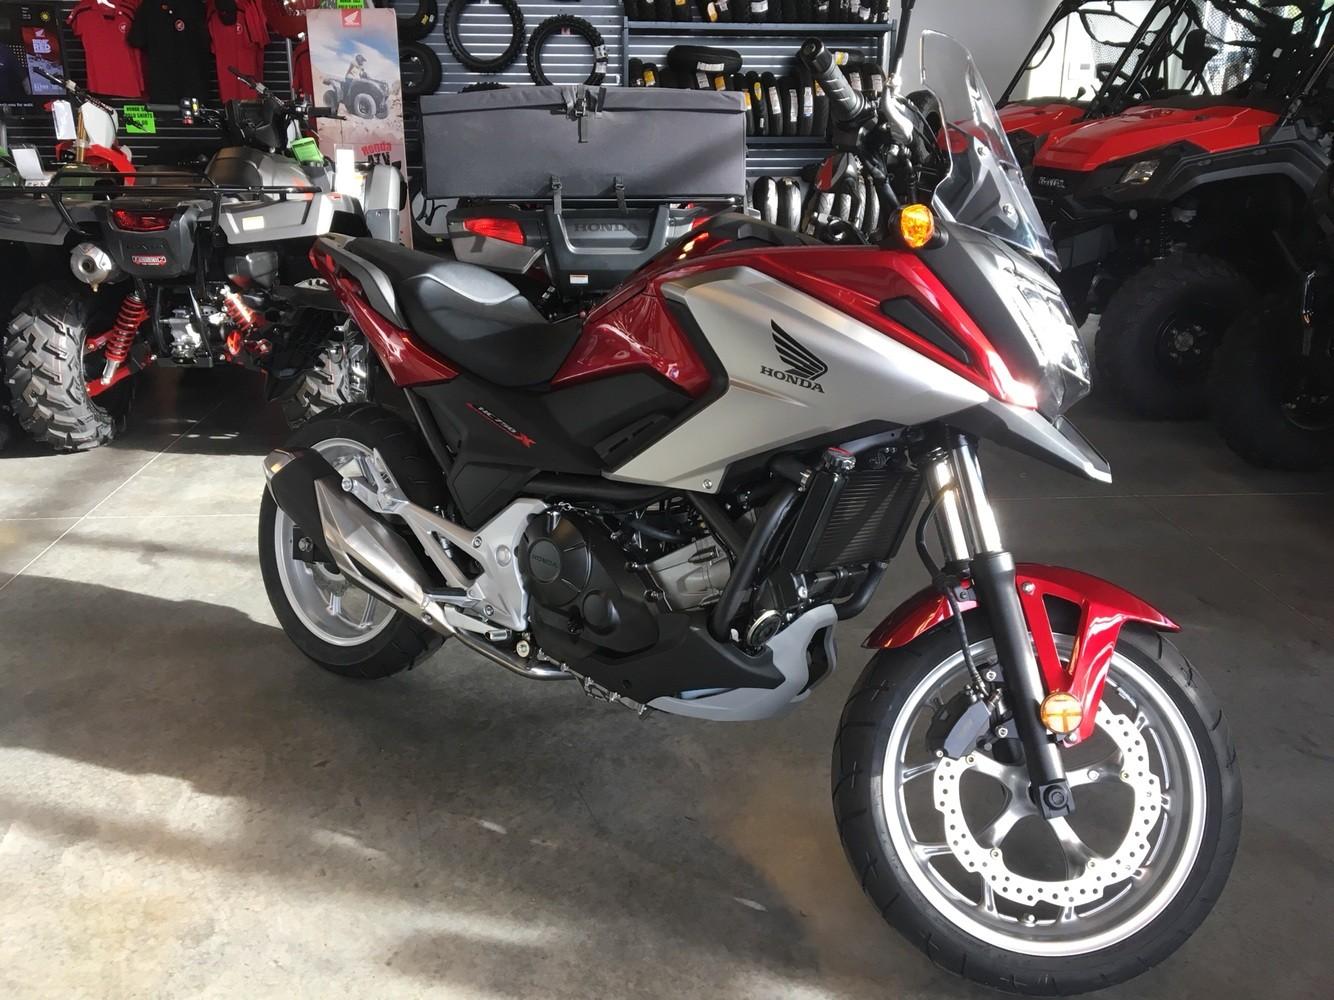 New 2018 Honda Nc750x Motorcycles In Saint George Ut Stock Number